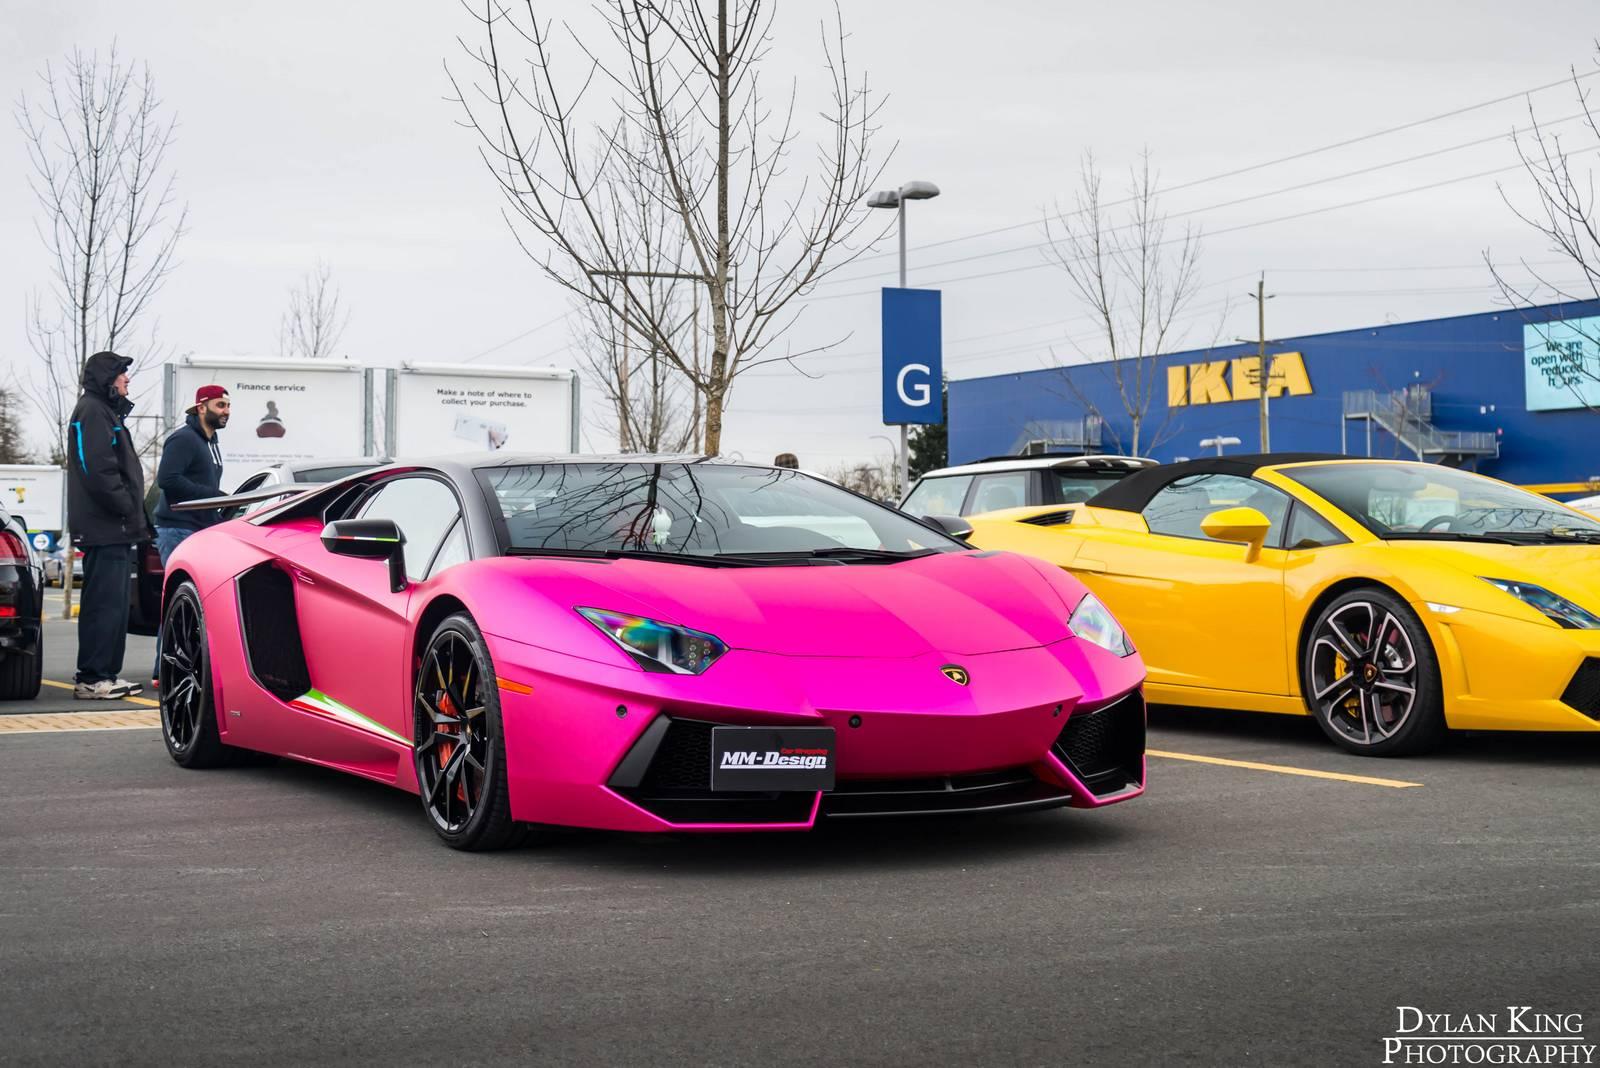 Lamborghini reventon pink